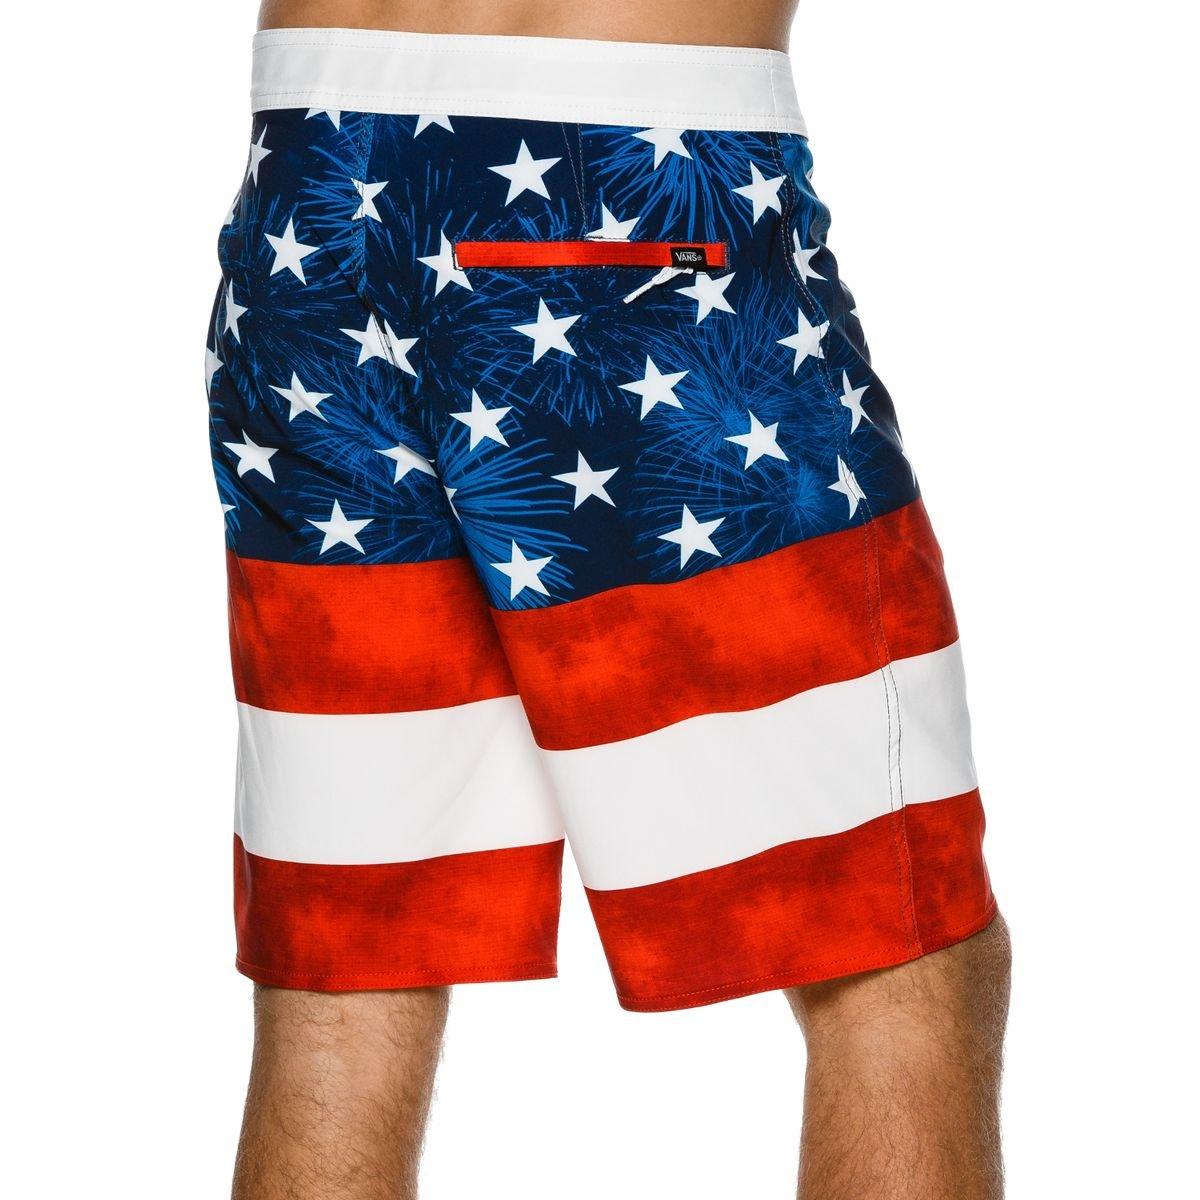 dae9065cfb Vans Wall Men's Era USA Boardshorts - American Flag | Amazon.com